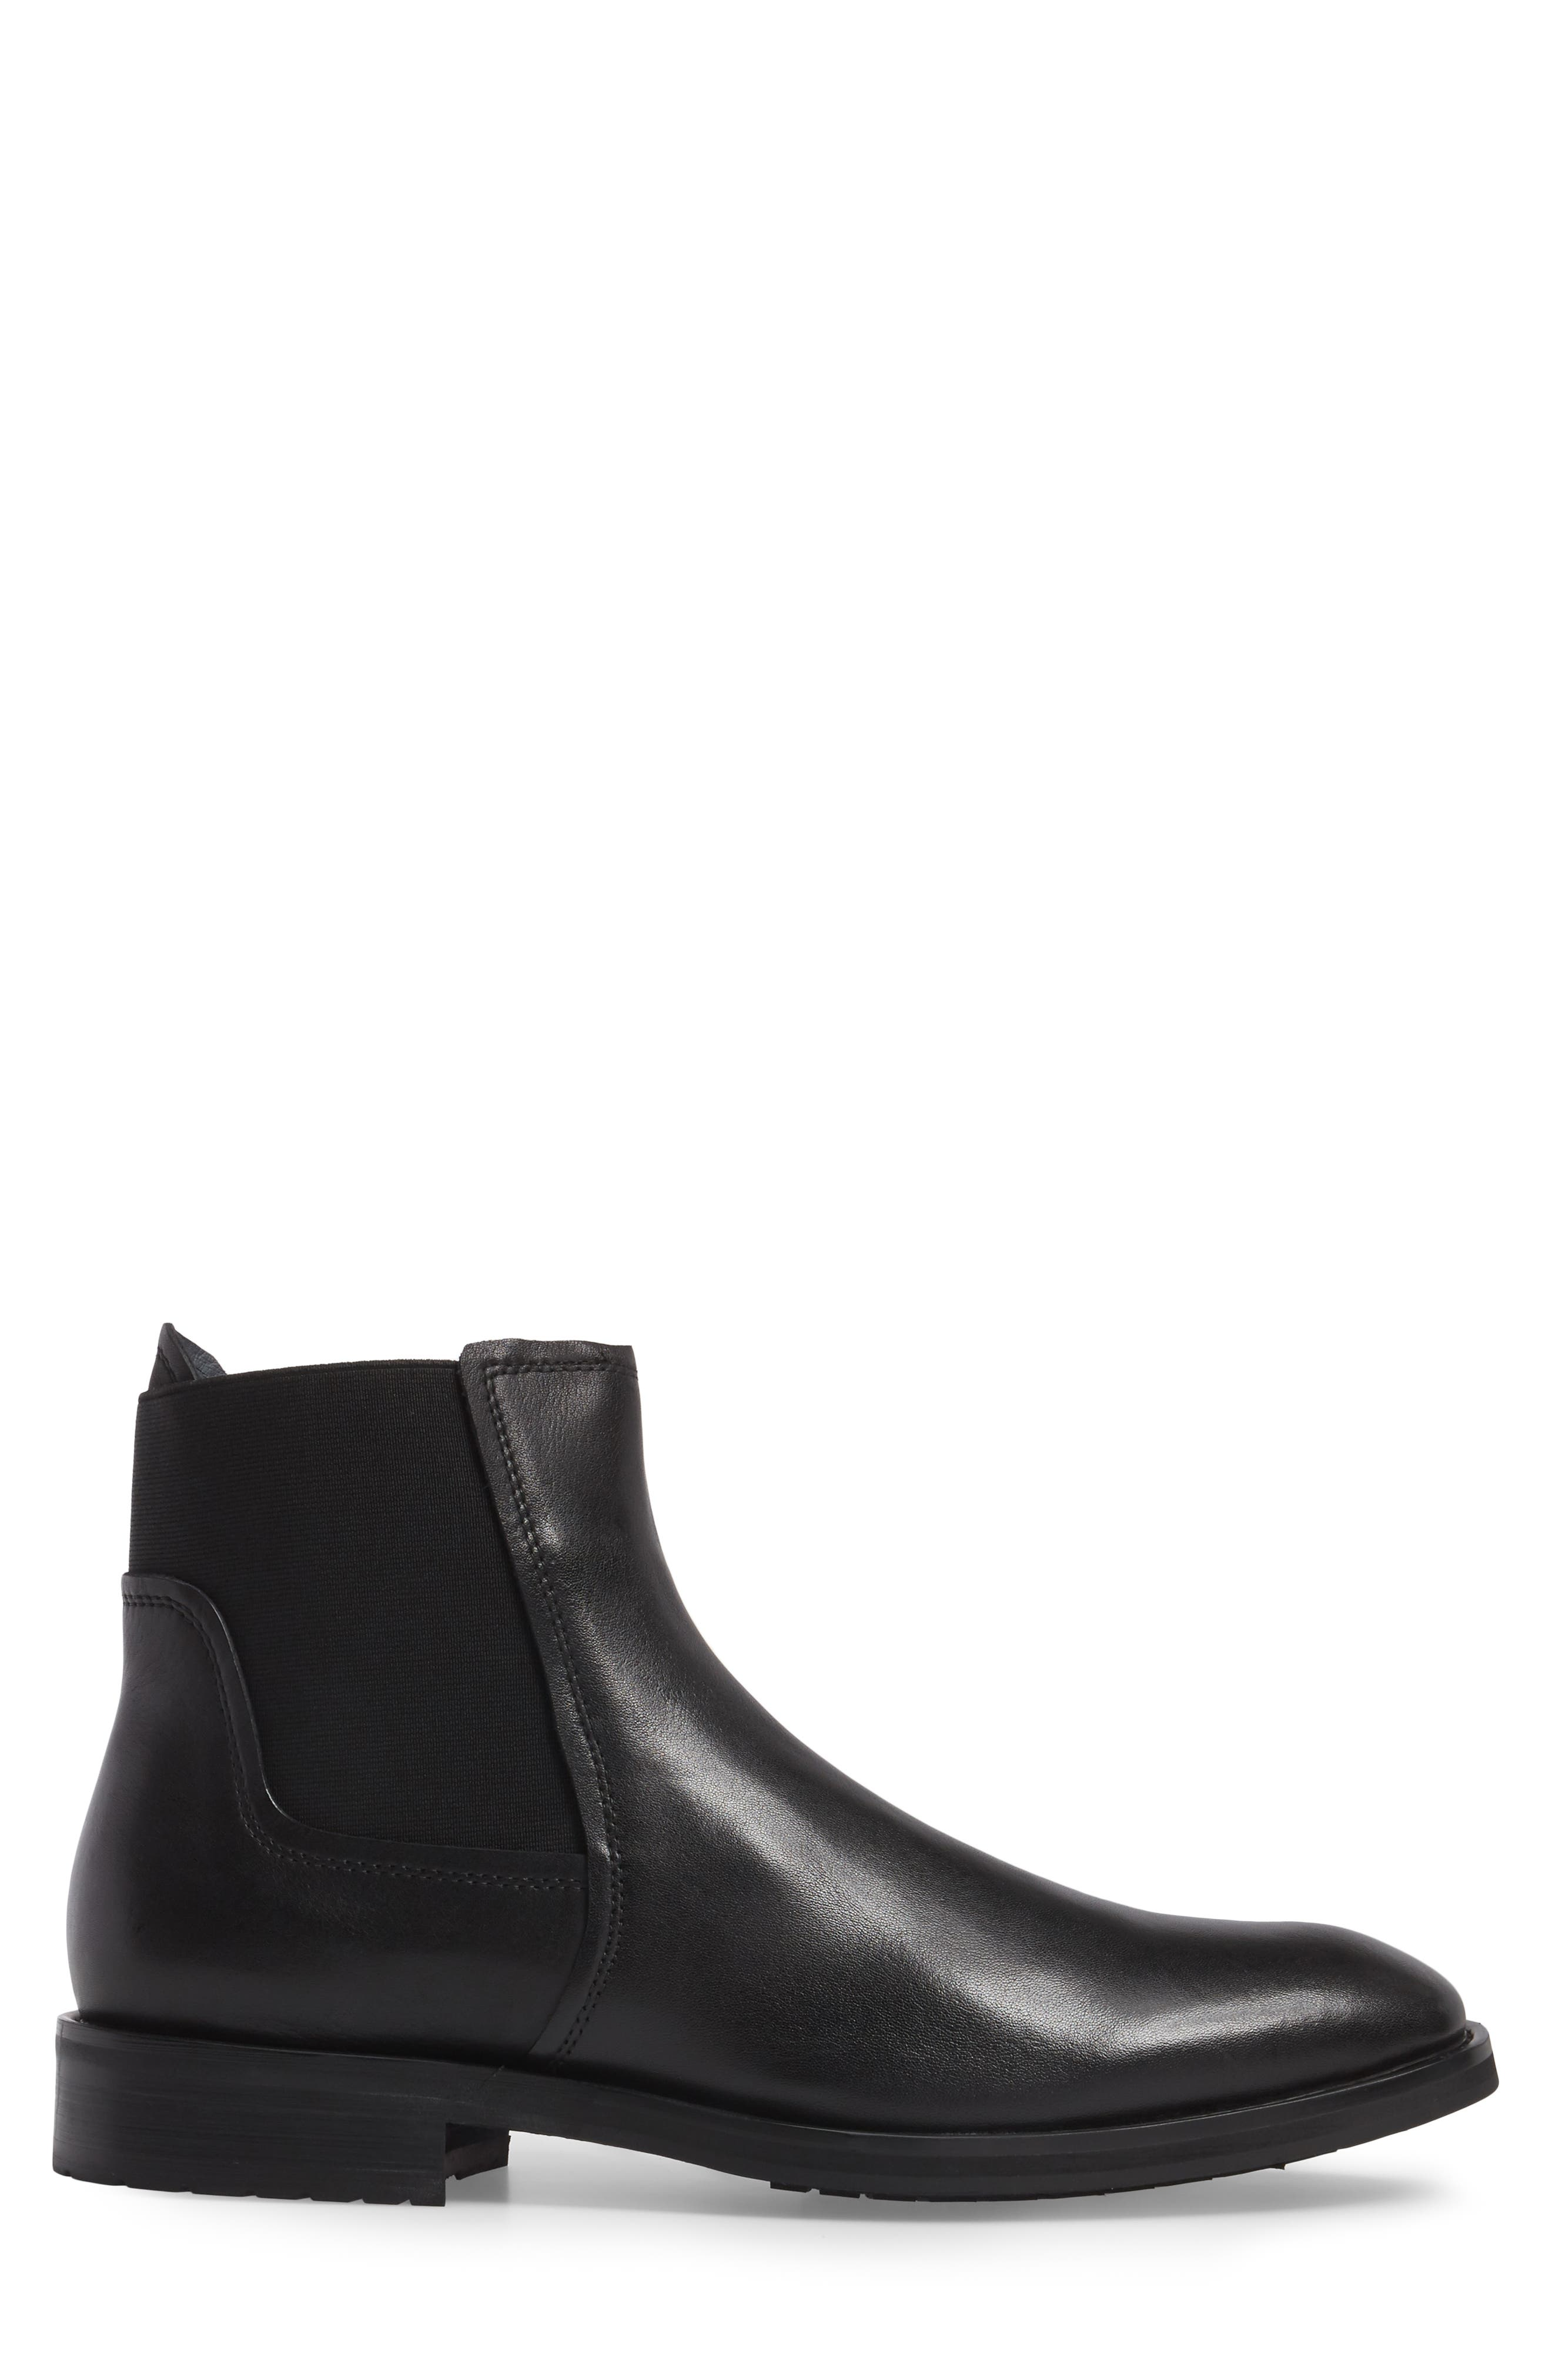 Belmont Chelsea Boot,                             Alternate thumbnail 3, color,                             Black Leather